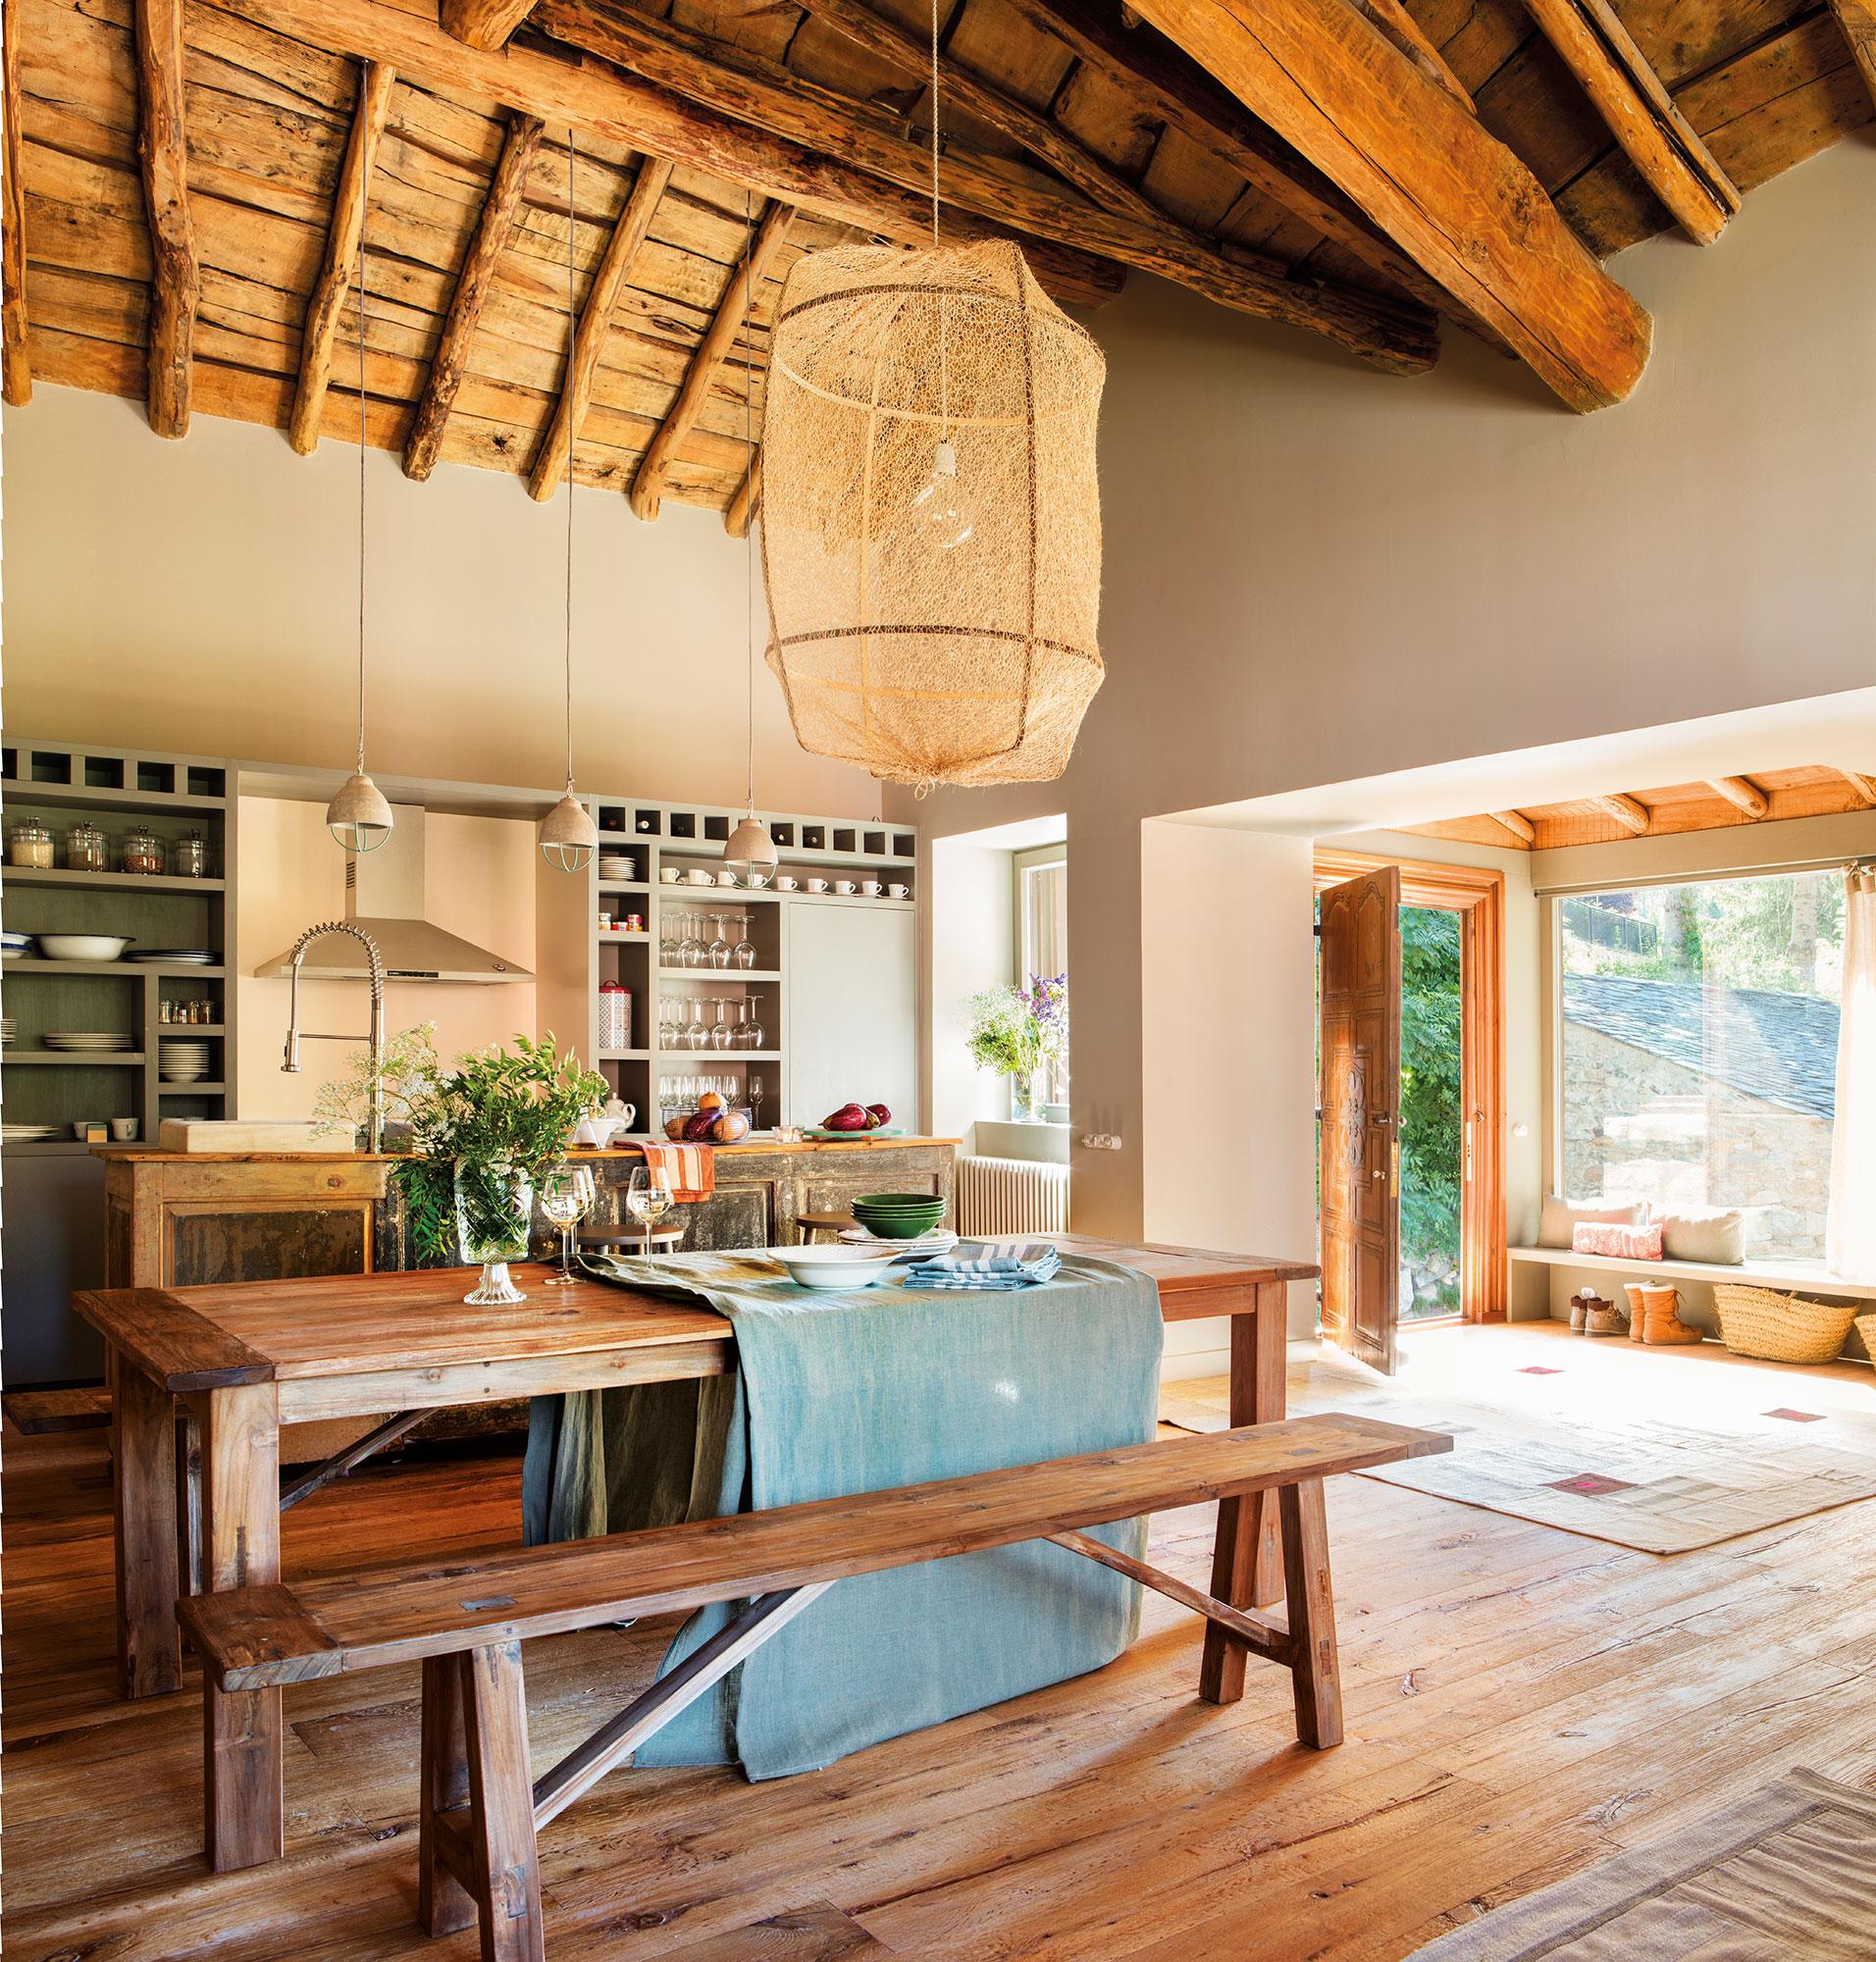 Mesas de comedor c mo elegir tu mesa de comedor perfecta - Muebles de comedor rusticos modernos ...